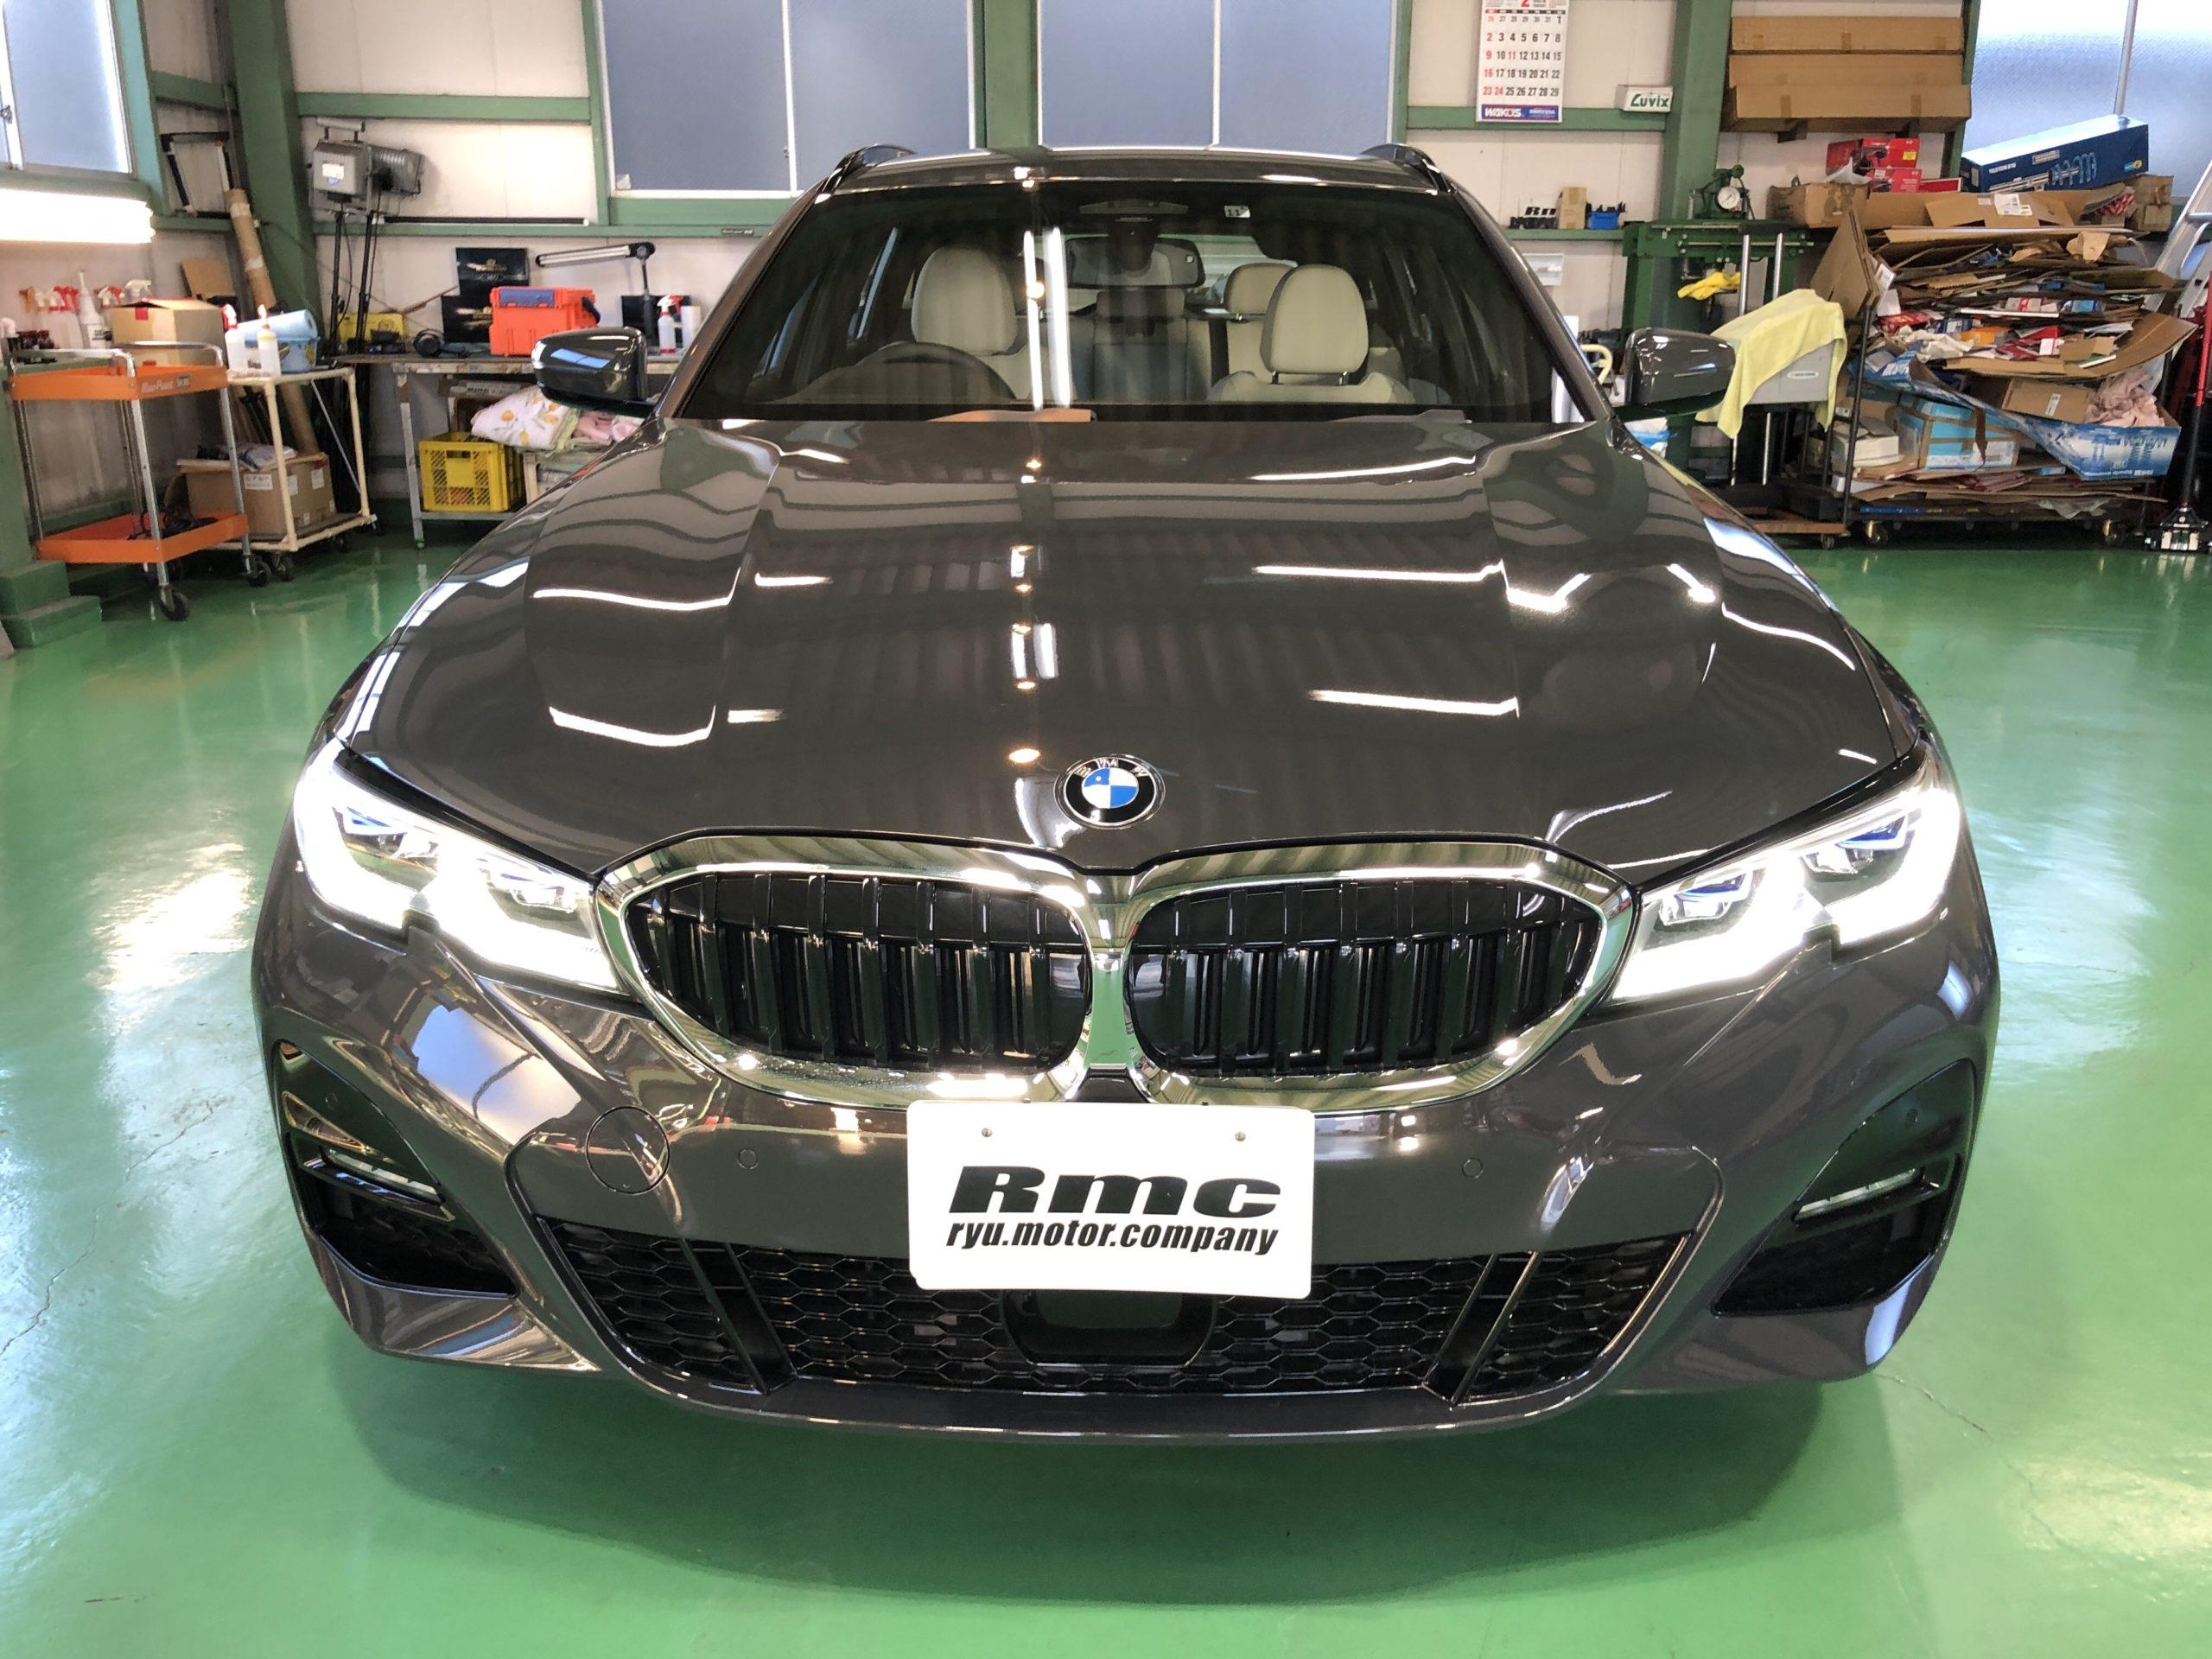 BMWG21320dXdriveツーリングMsport試乗❗️